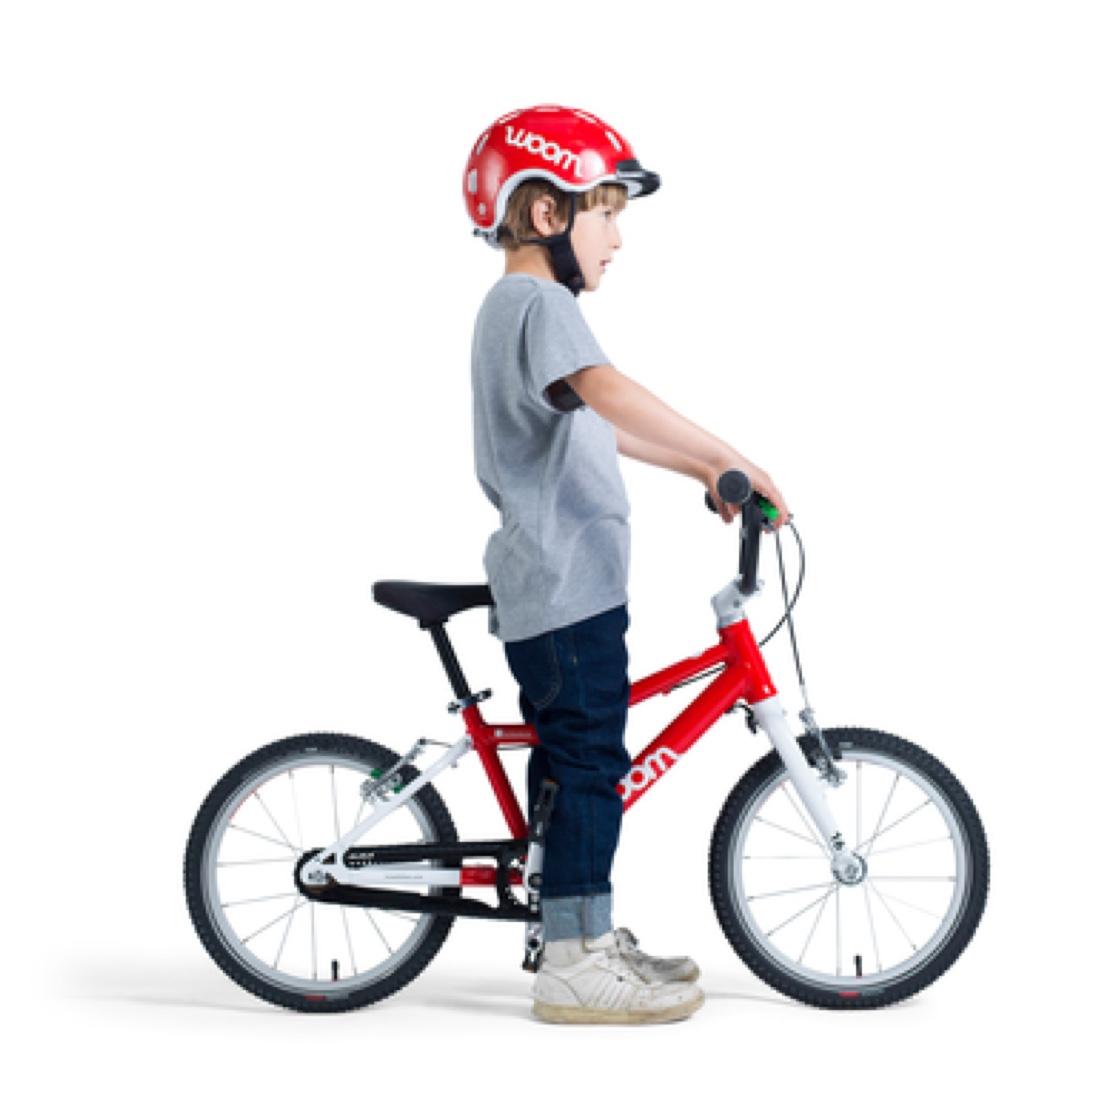 bike posture standing